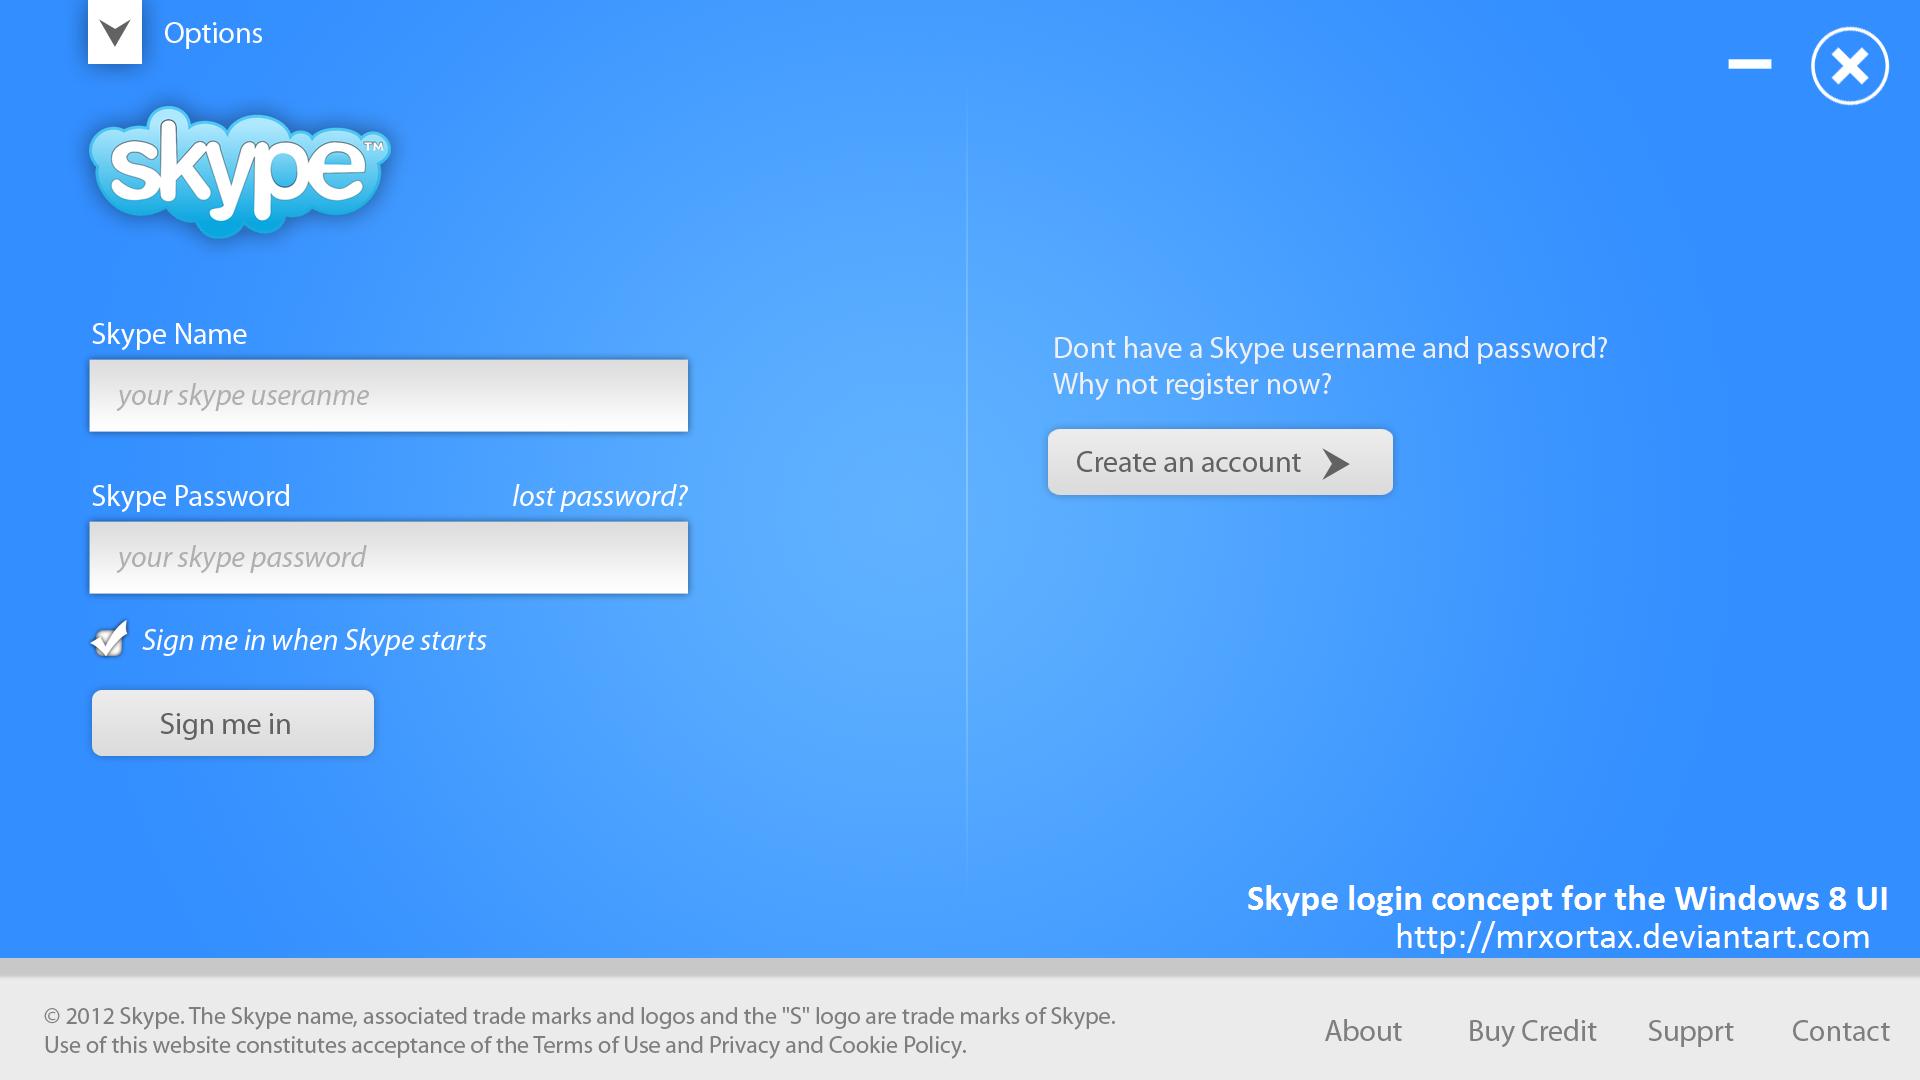 Skype login account -  Skype Login Concept For Windows 8 Ui By Mrxortax